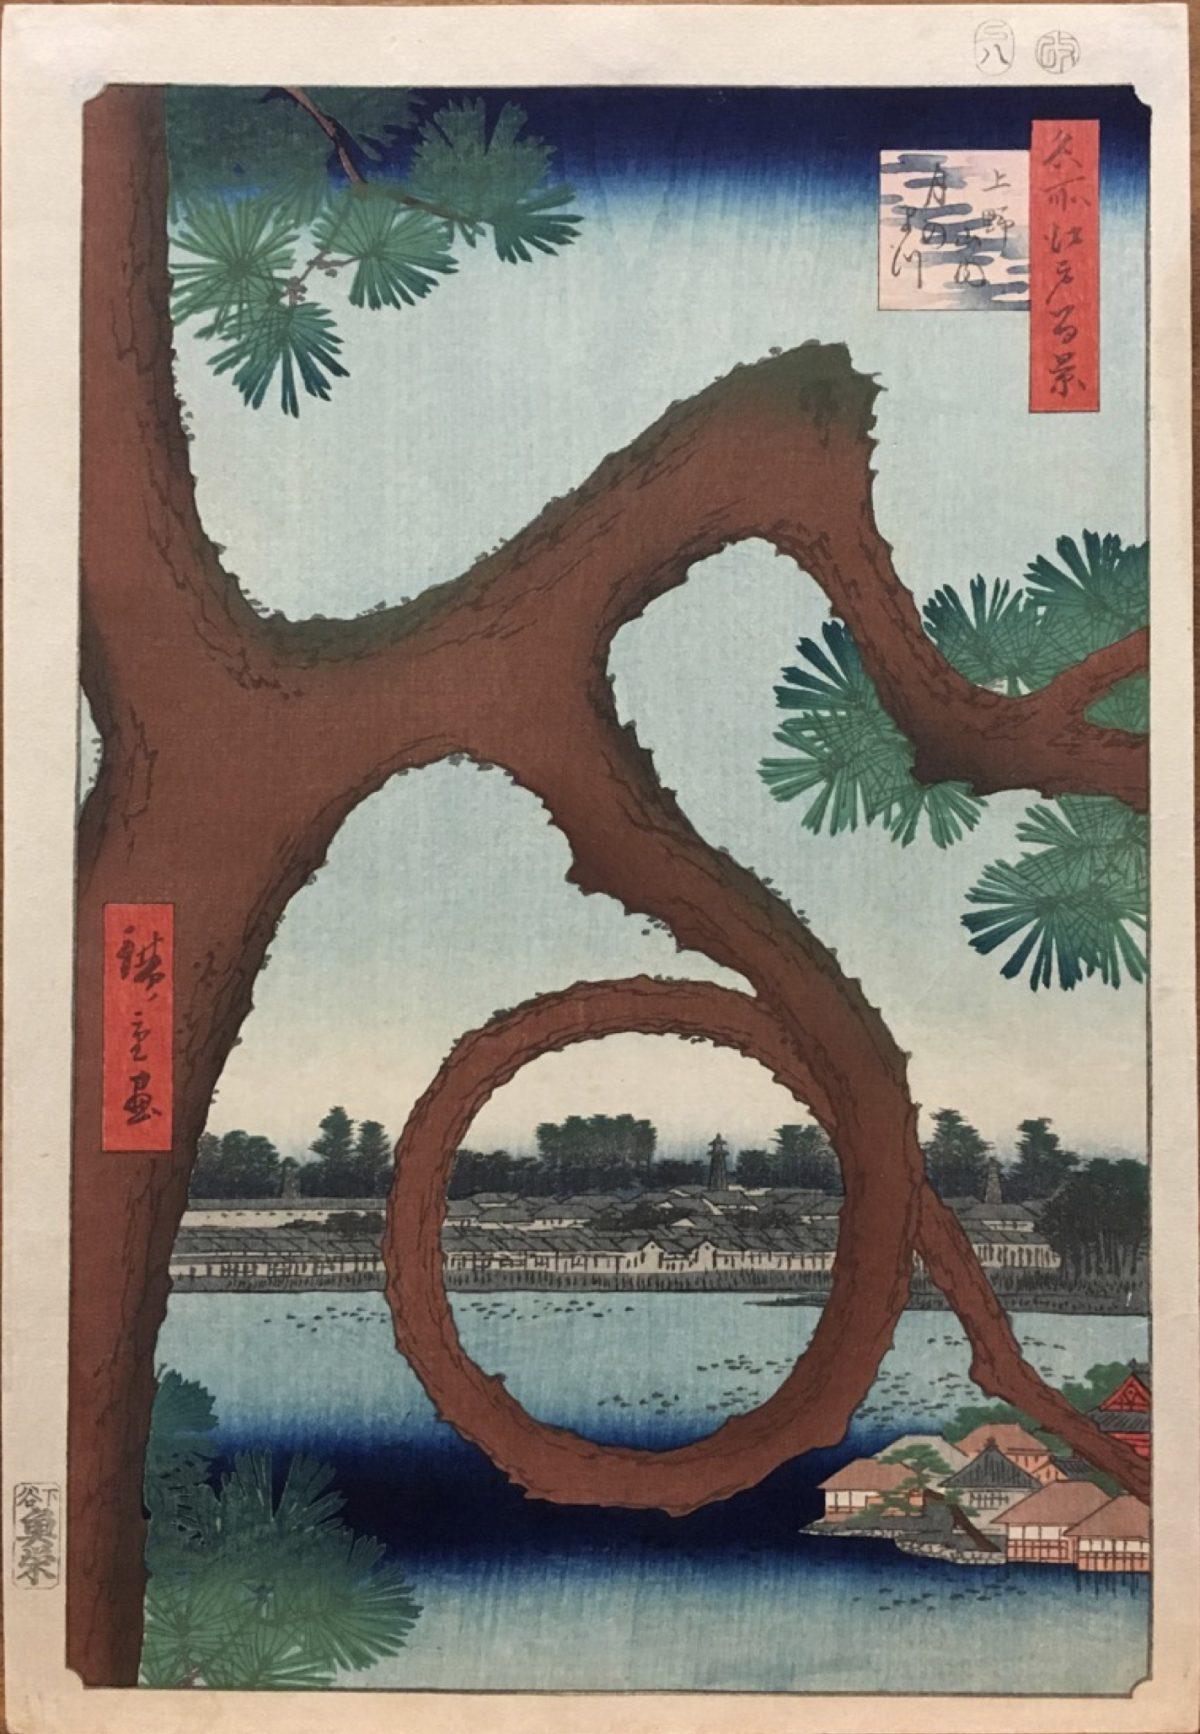 Pine tree mountain water in Japan